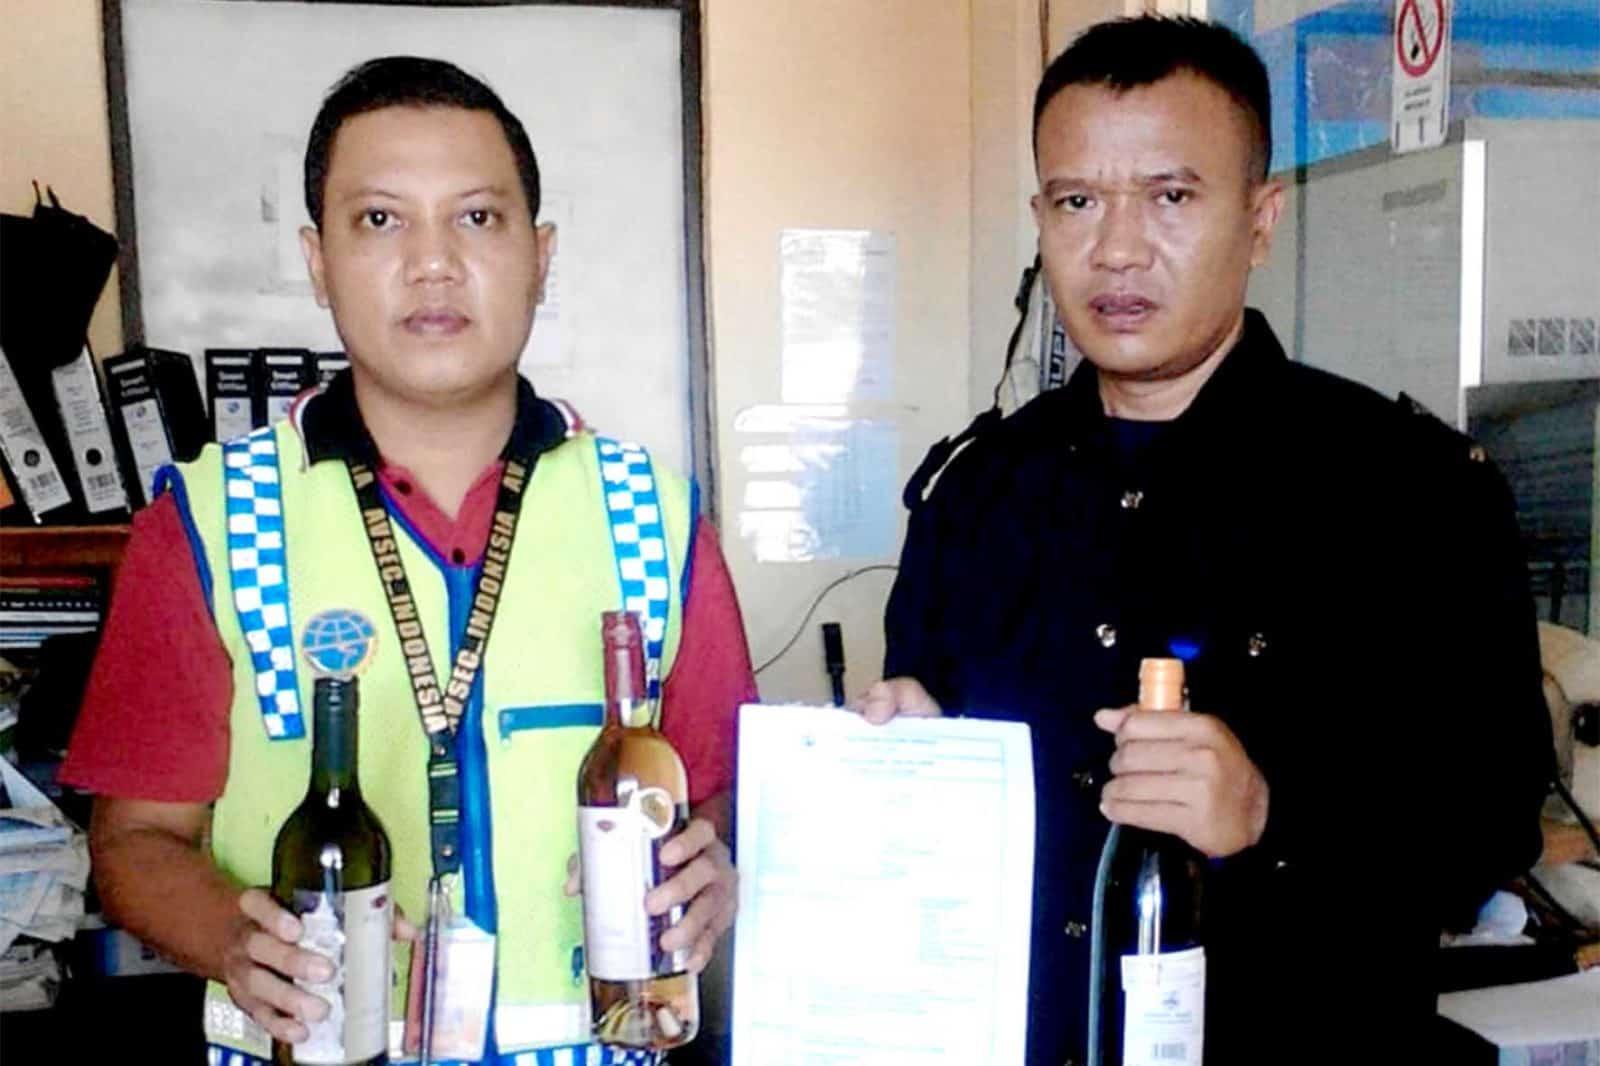 Satgas Pamrahwan Yonko 462 Paskhas Pos Jayapura Gagalkan Pengiriman Minuman Keras